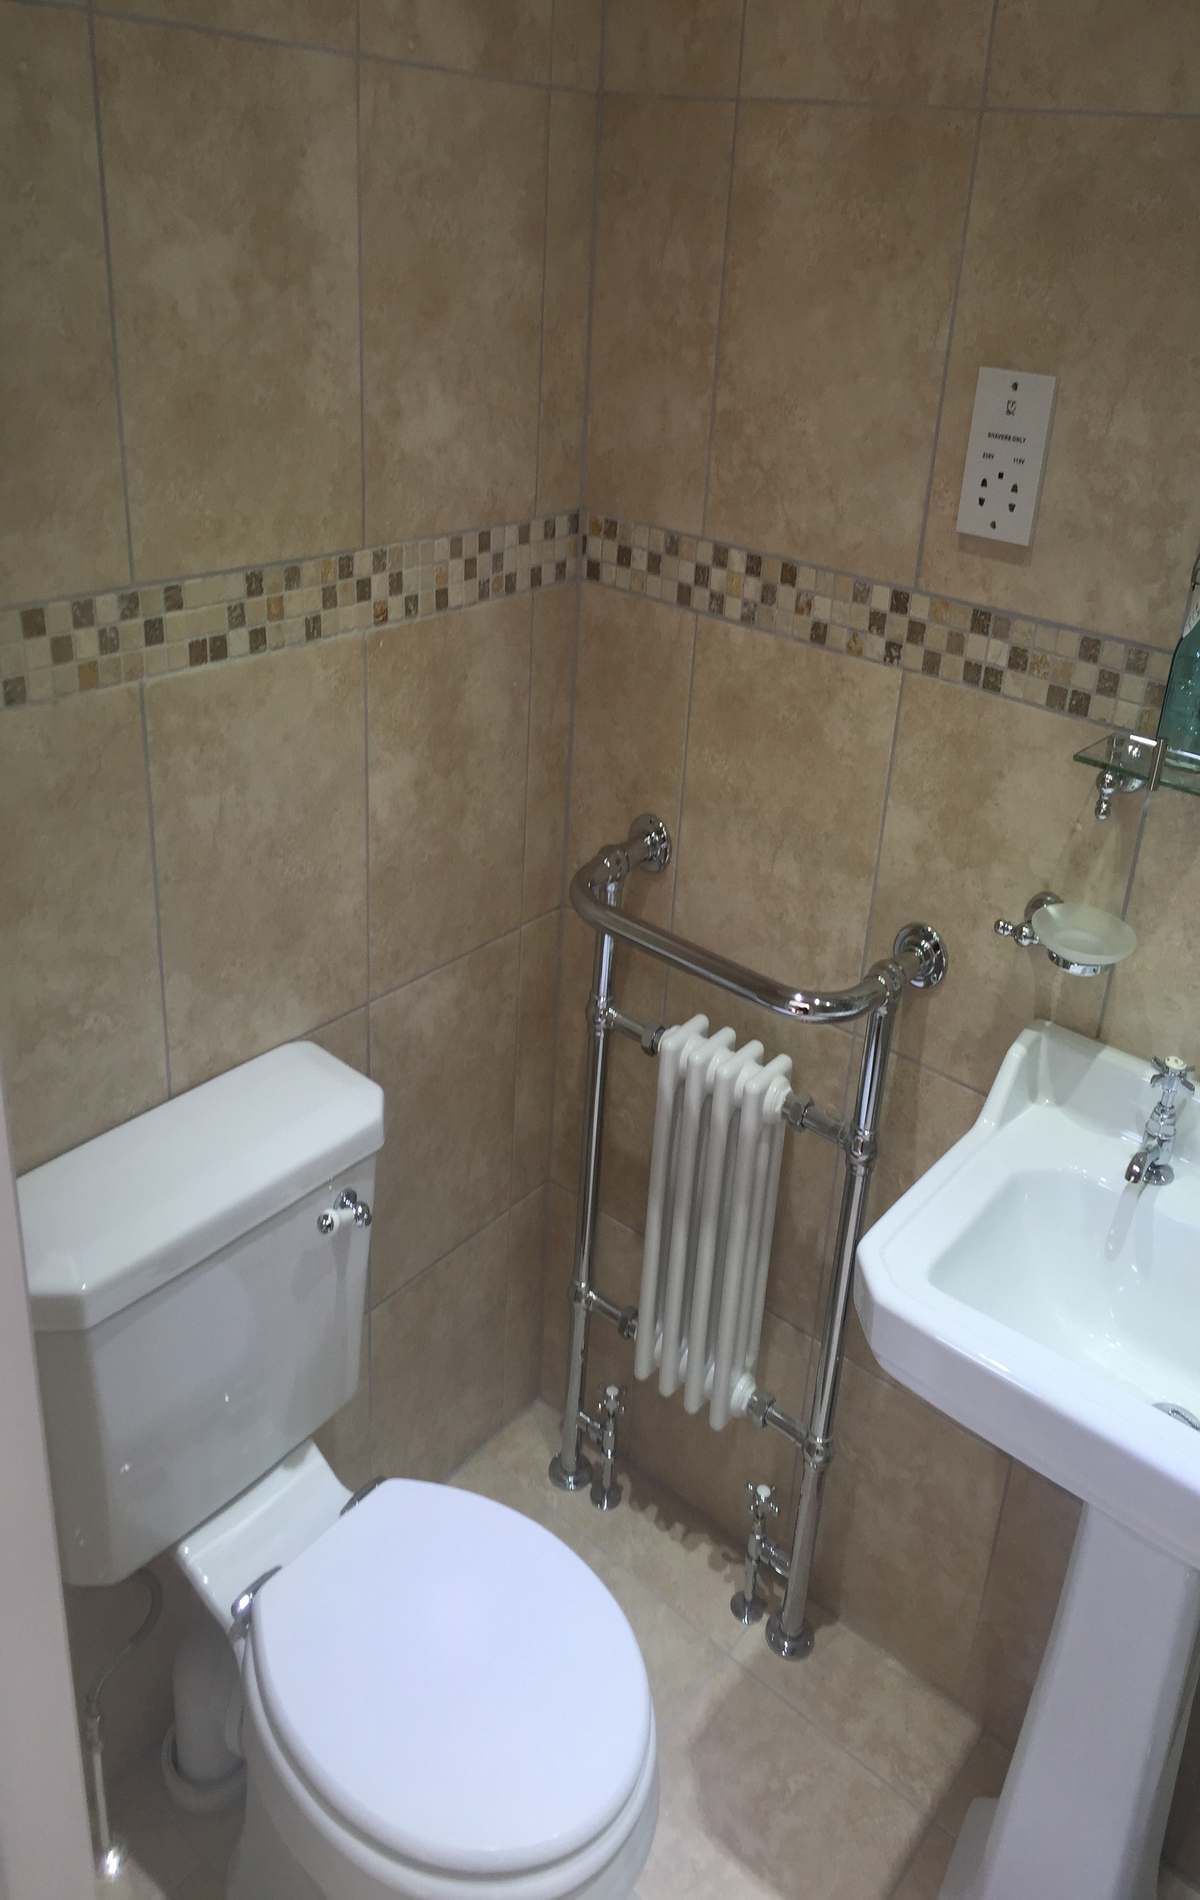 Bathroom and Renovation